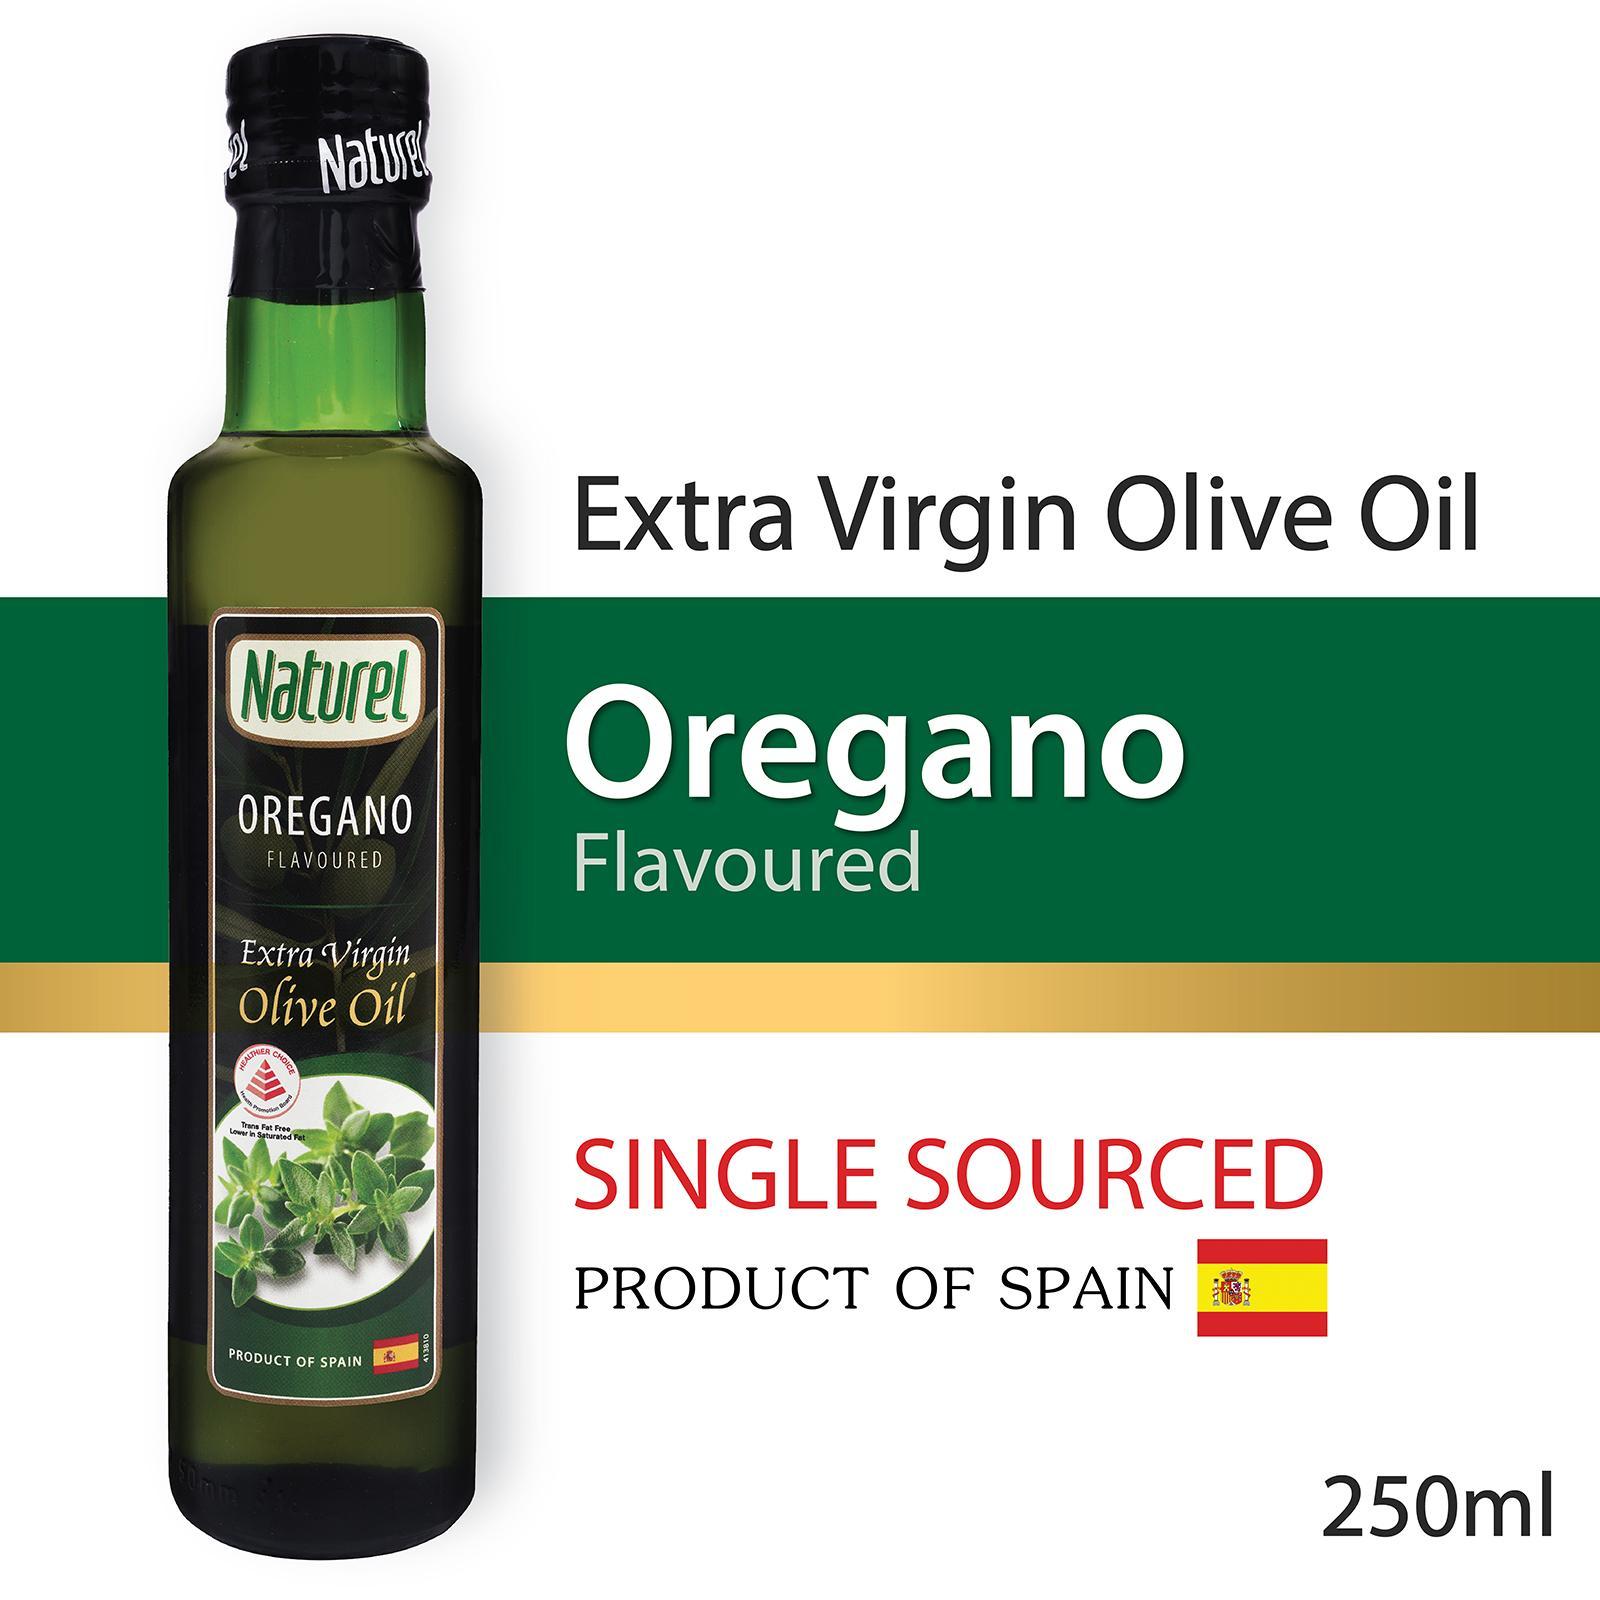 Naturel Extra Virgin Olive Oil - Oregano Flavoured